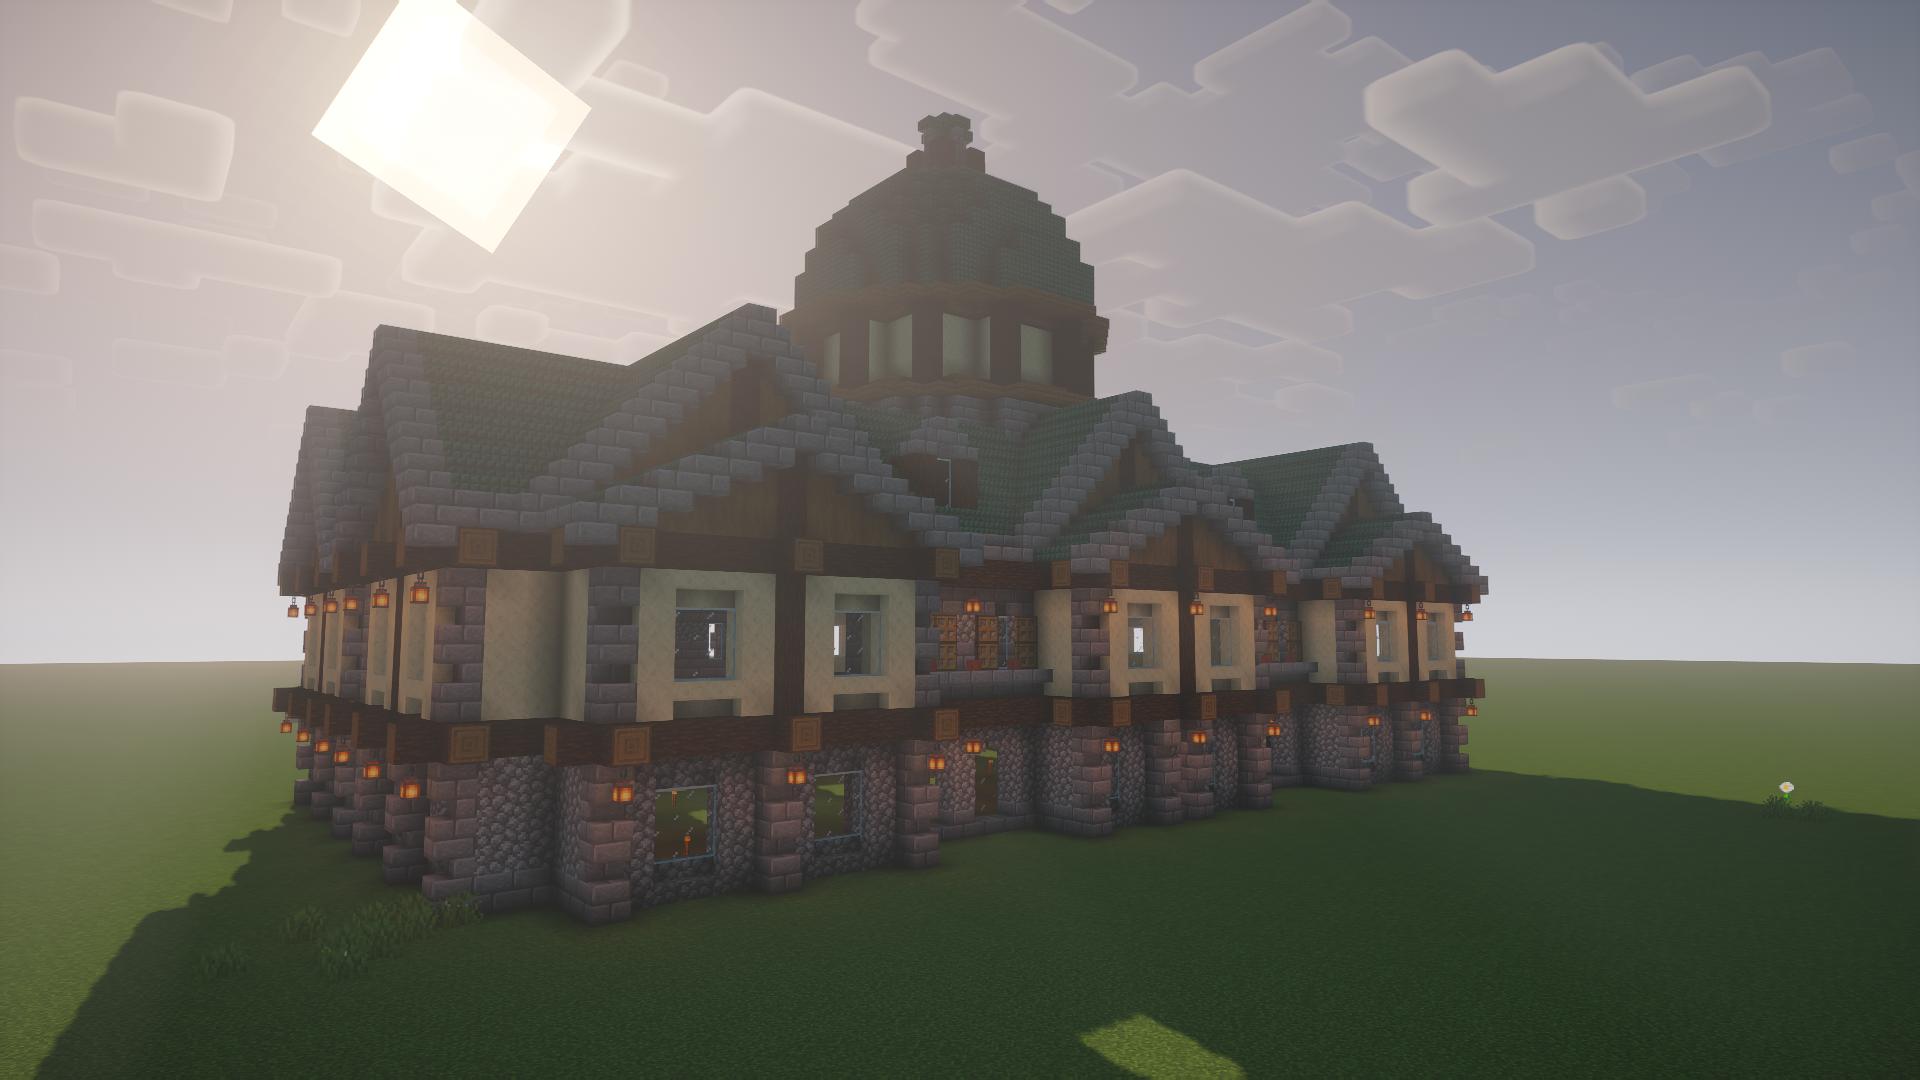 Copper roof mansion By u/kamojama